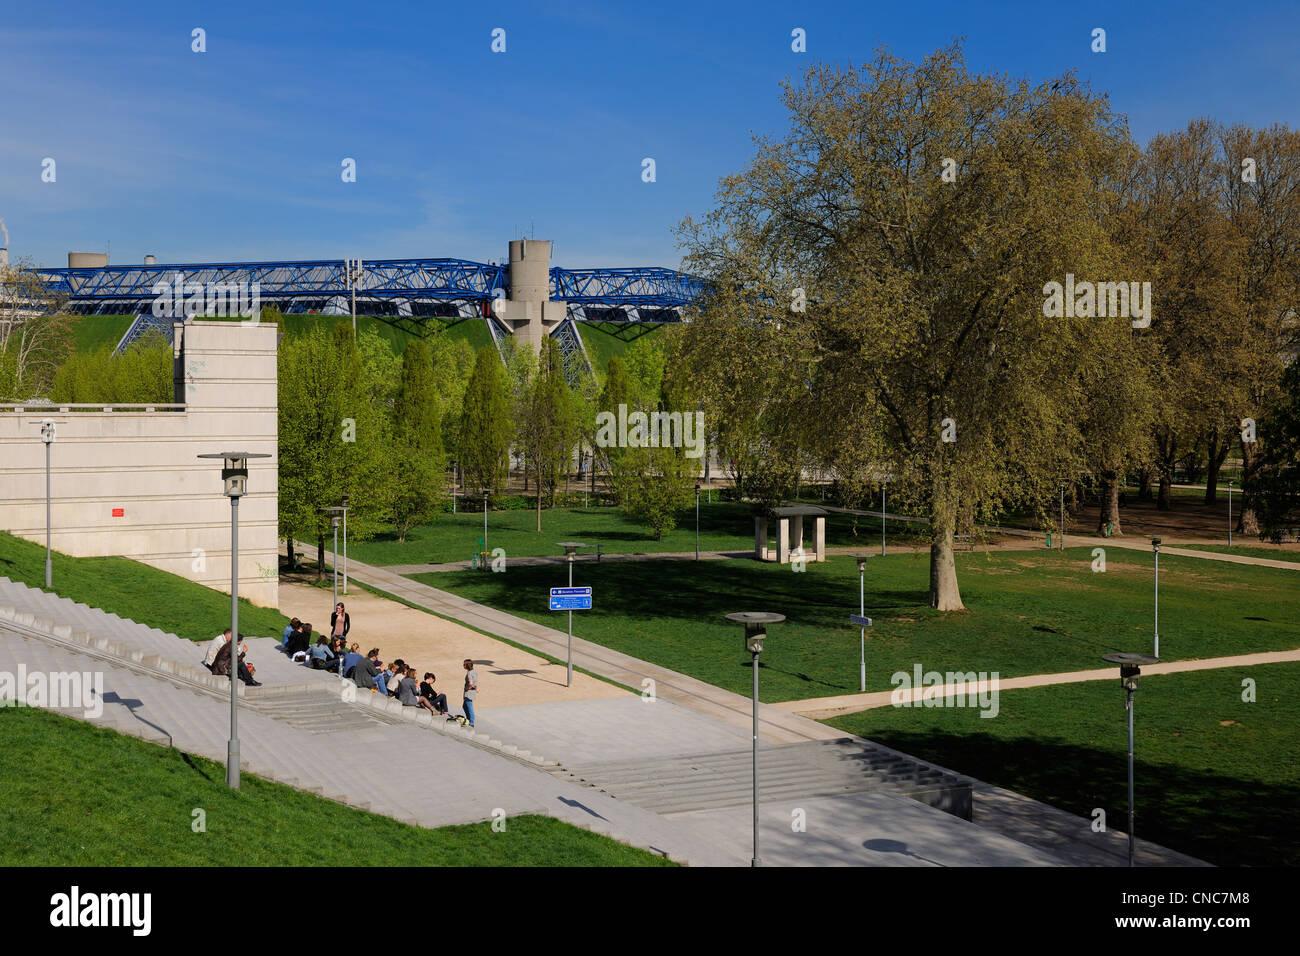 France, Paris, Palais Omnisports de Paris Bercy by architects Michel Andrault and Pierre Parat - Stock Image